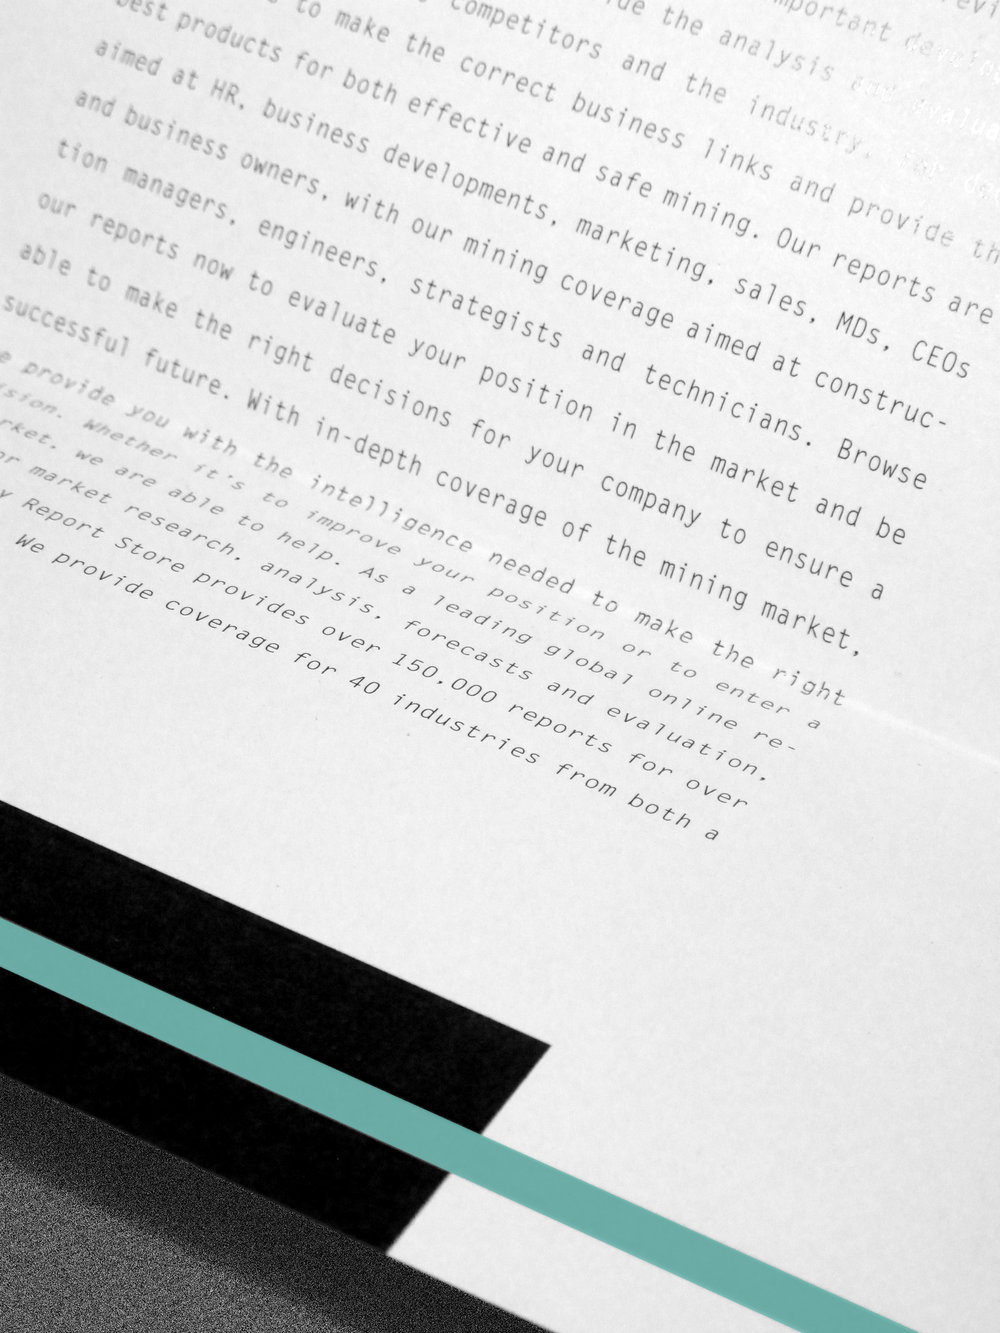 Detail of the letterhead